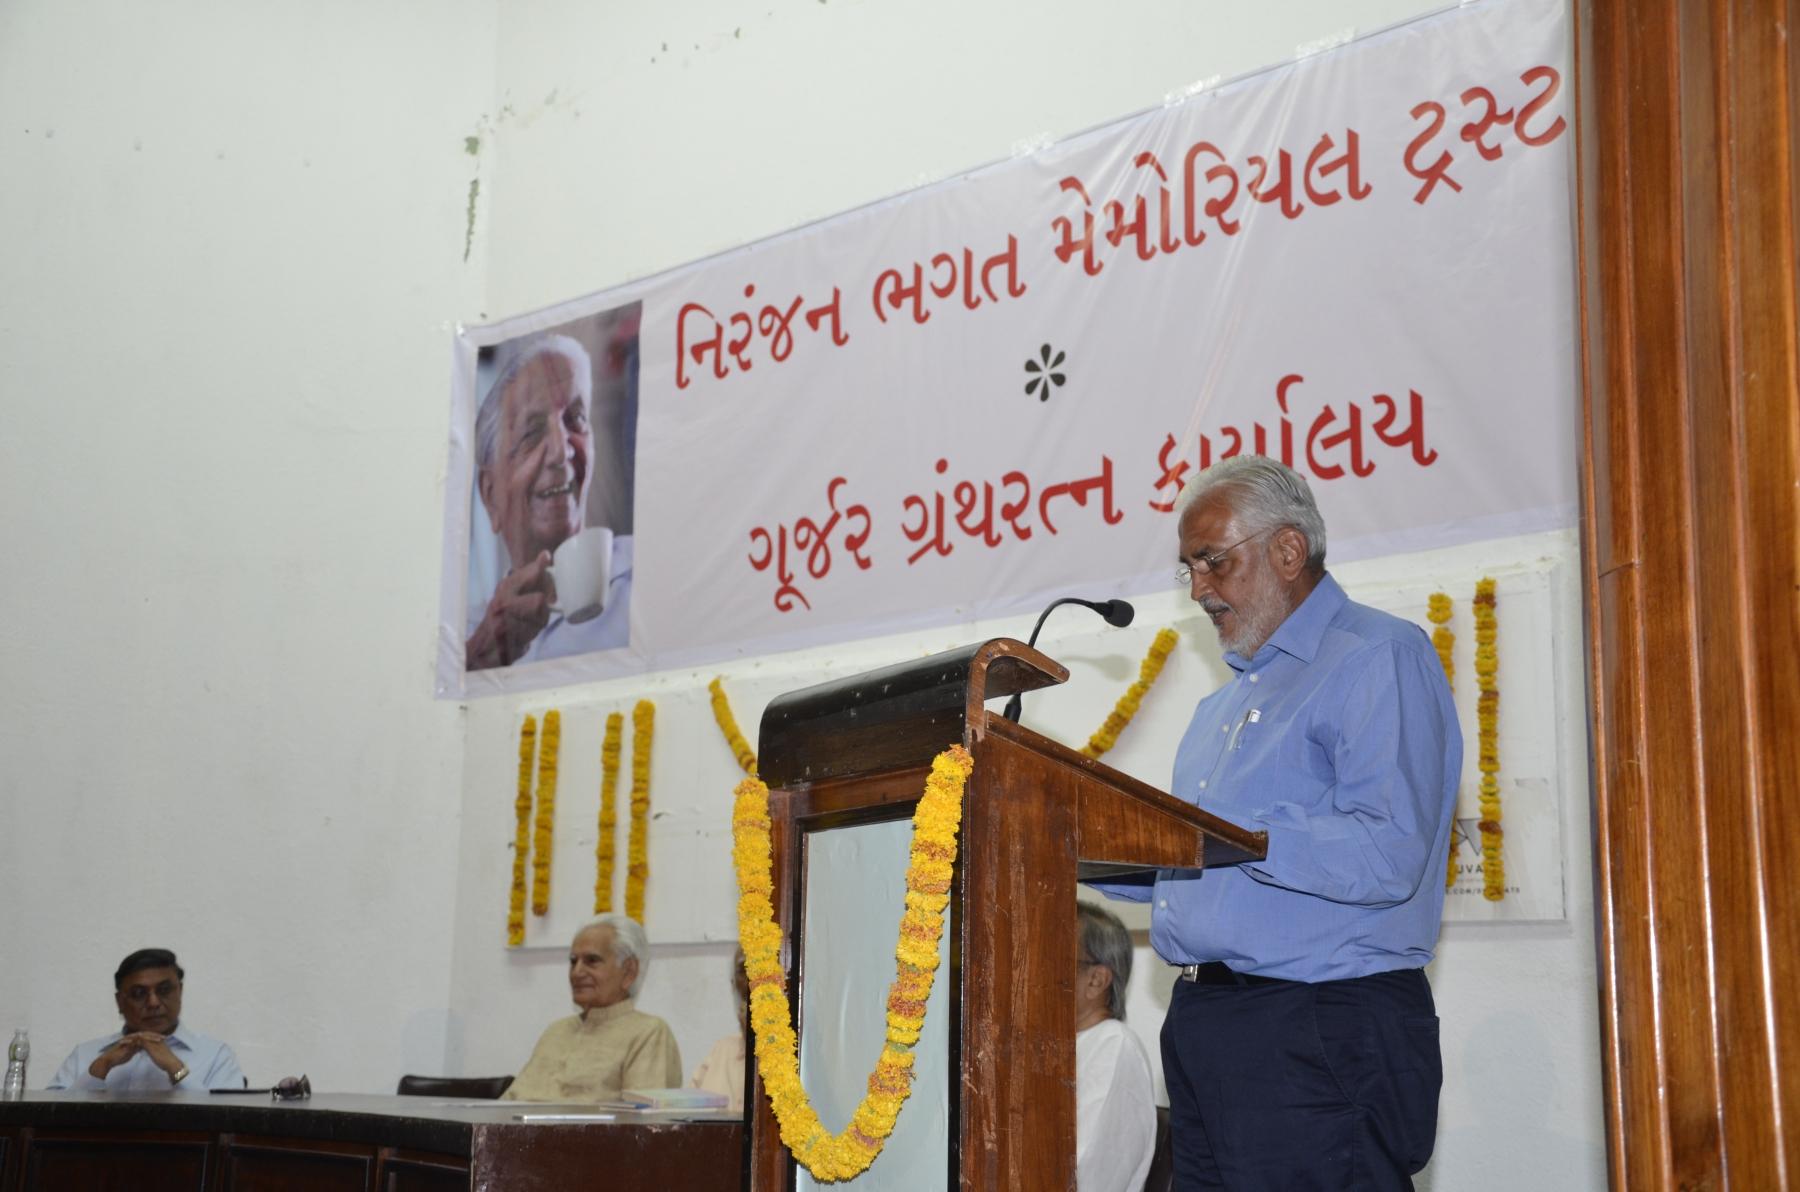 Shri Chintan Parikh's talk at the event